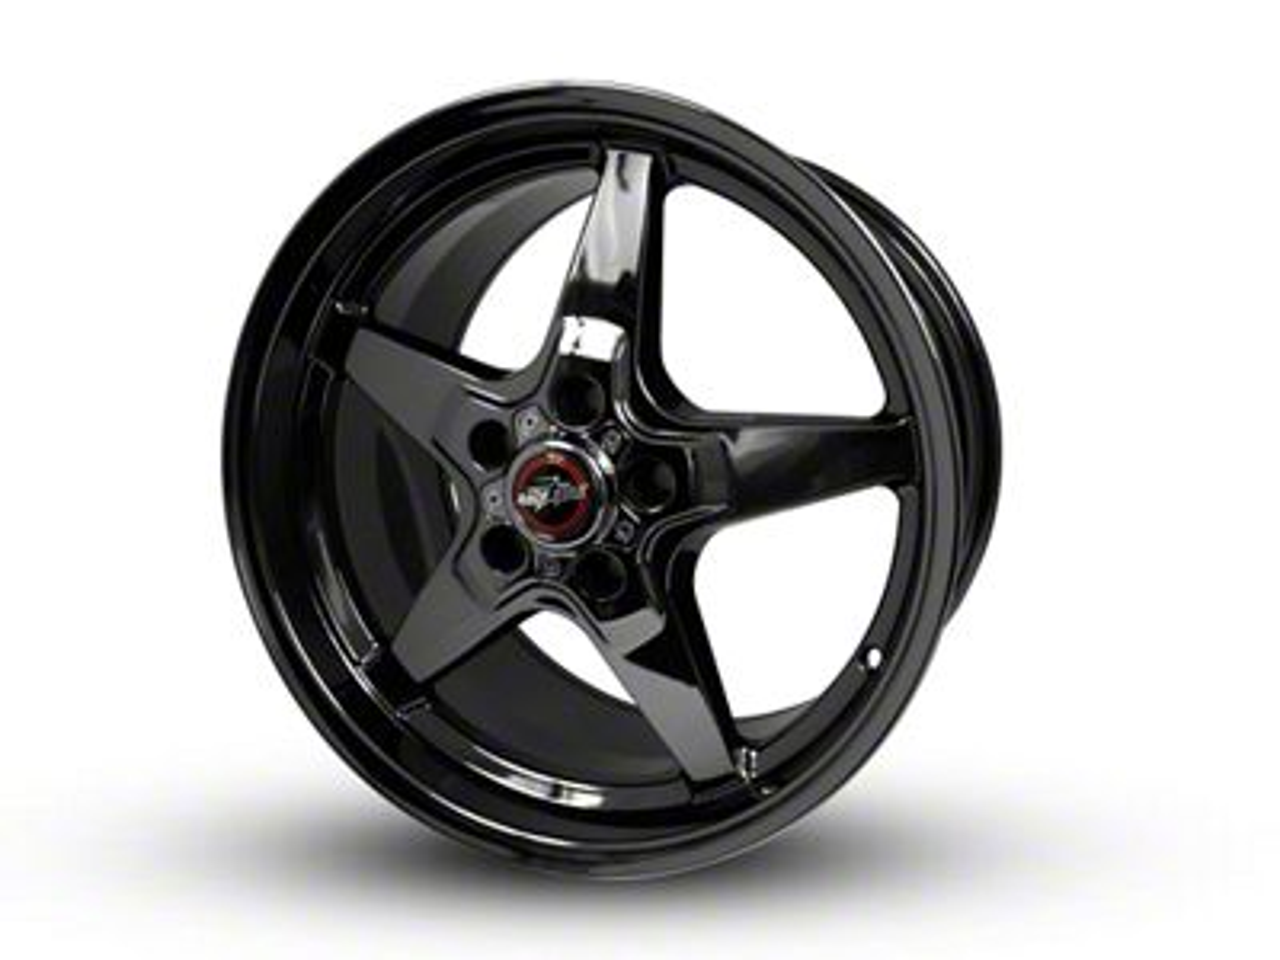 Race Star Dark Star Drag Wheel - 18x10.5 (15-18 GT, EcoBoost, V6)